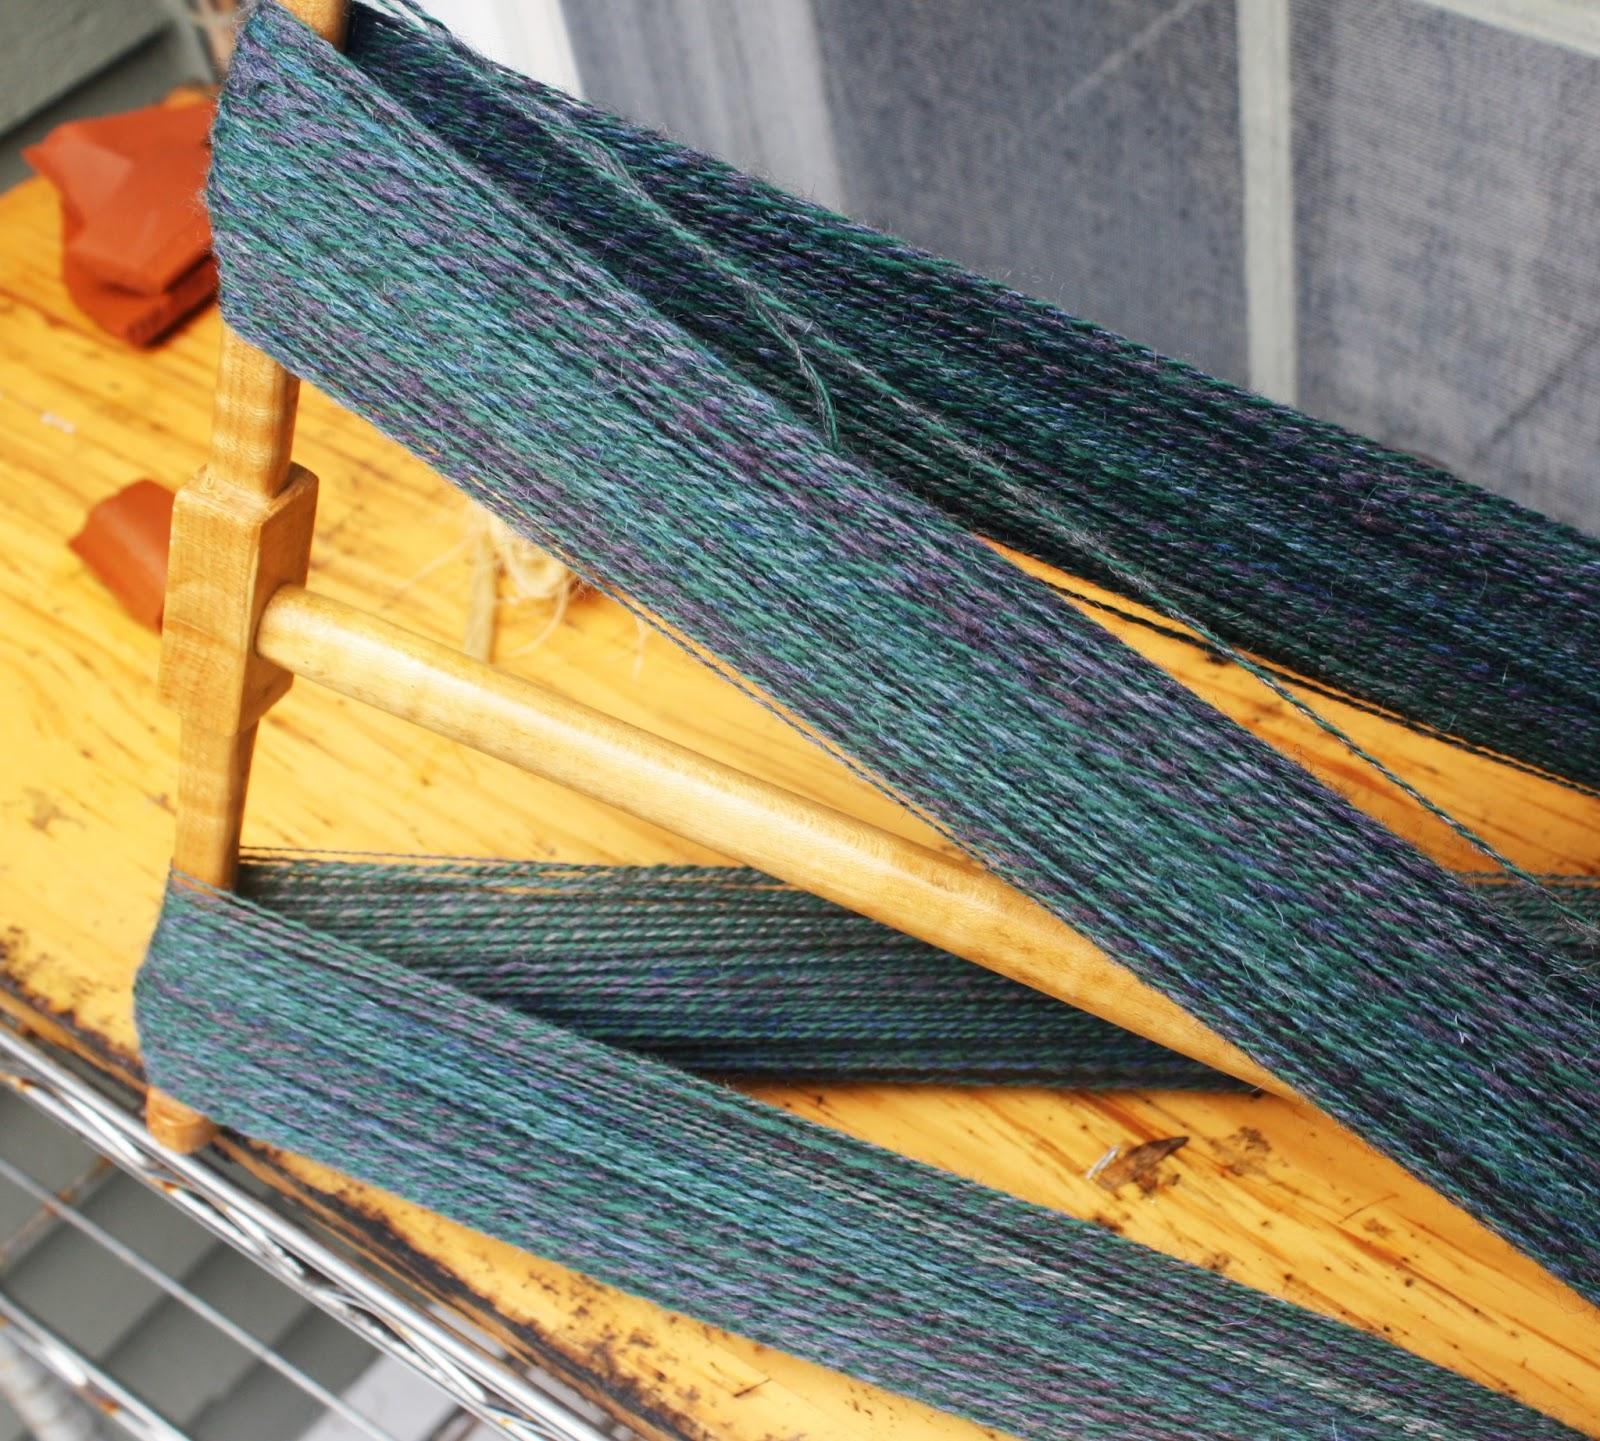 Knitting Tools List : Queerjoe s knitting top list of tools